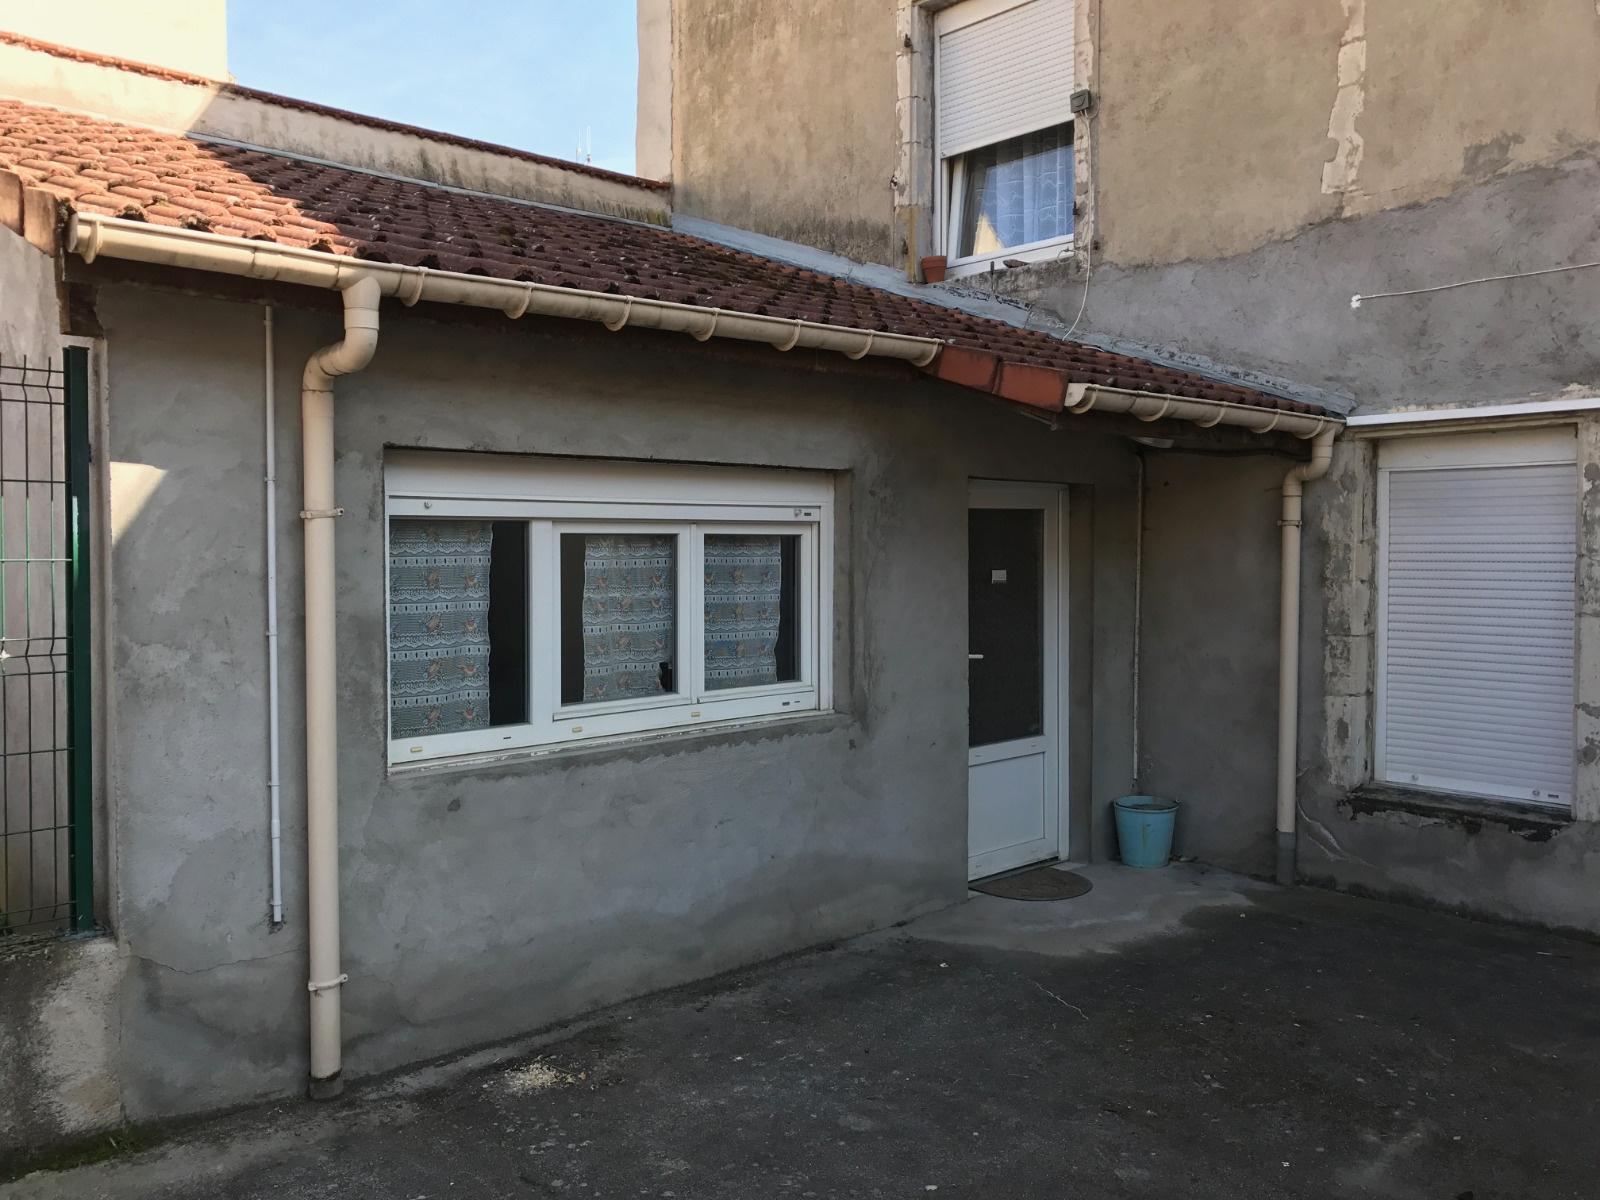 Vente appartement saint nicolas de port - Bouko immobilier saint nicolas de port ...